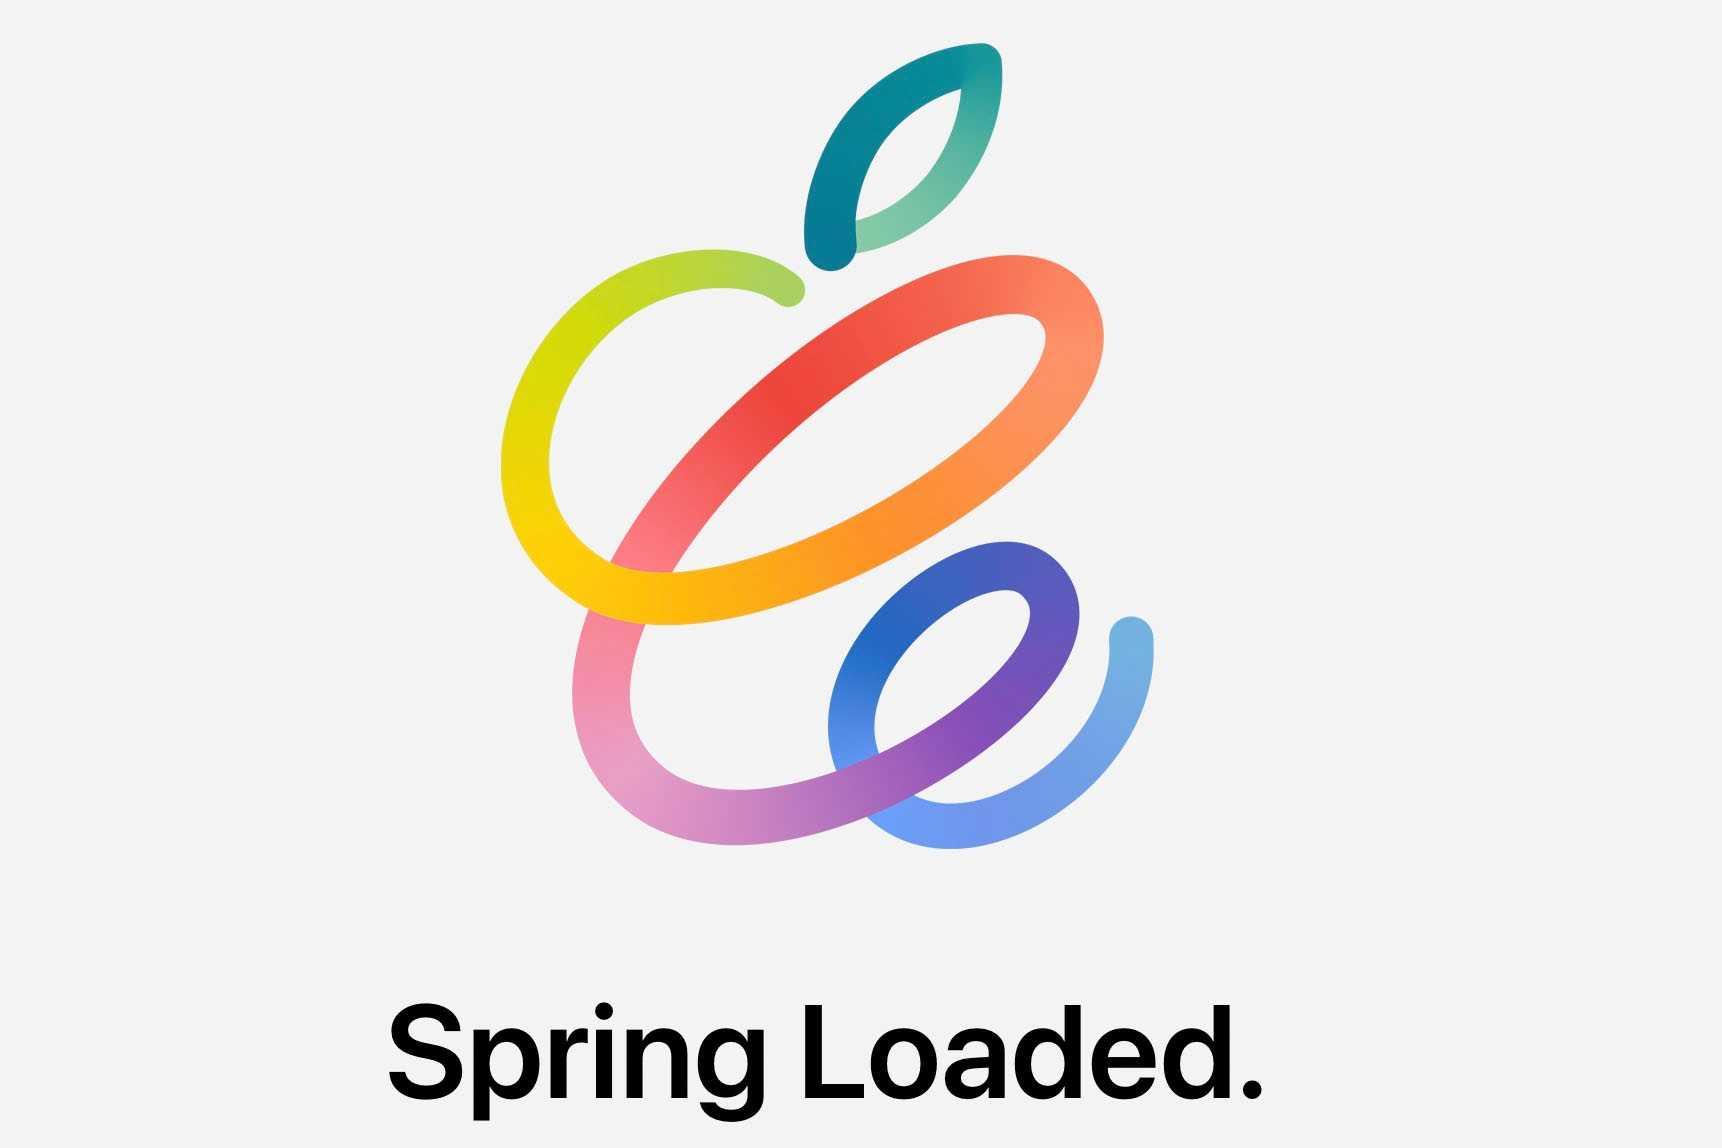 https://www.ictna.ir/apple-event-spring-loaded-text-7.jpg